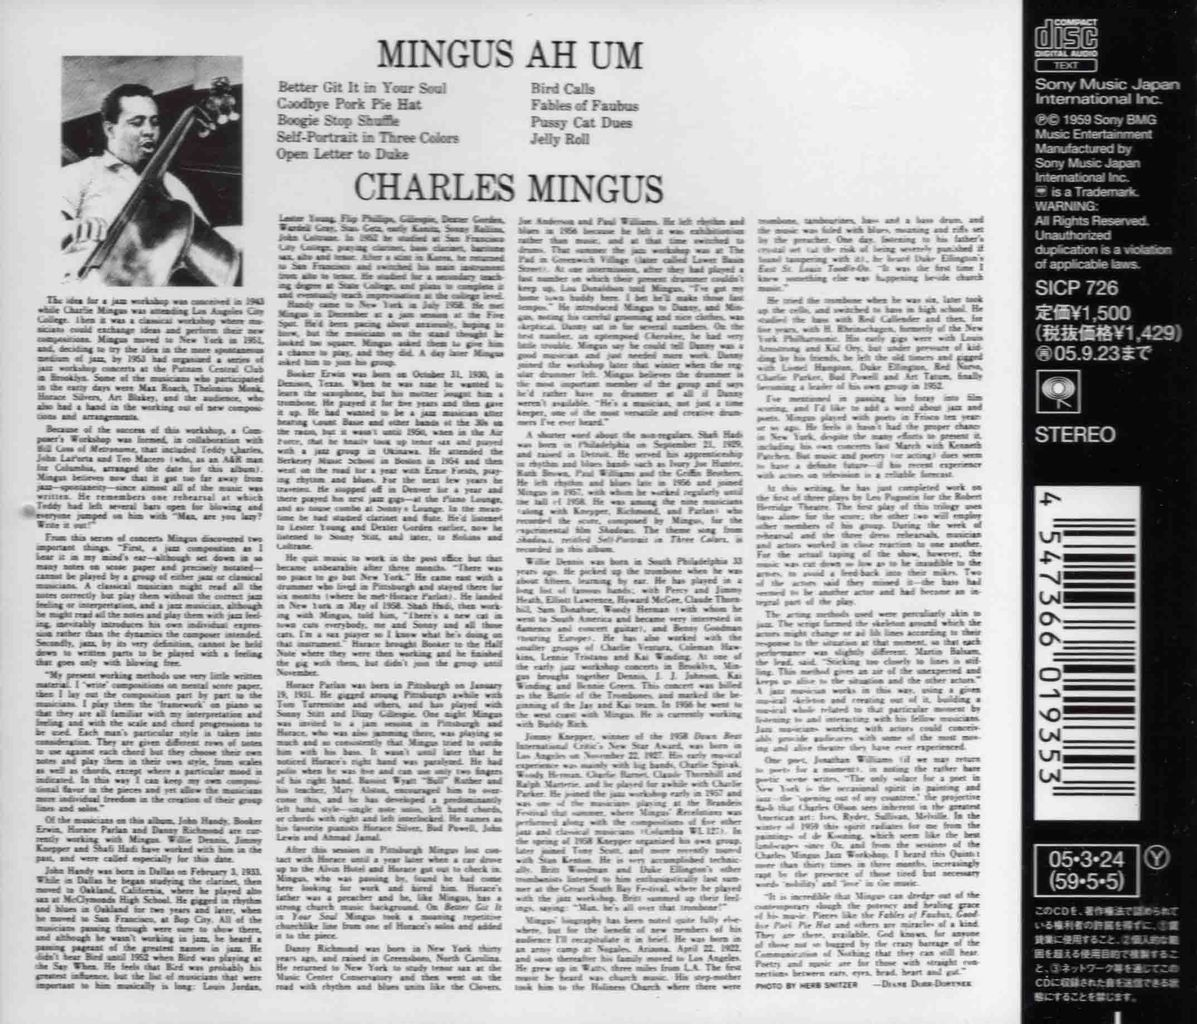 MINGUS AH UM-2